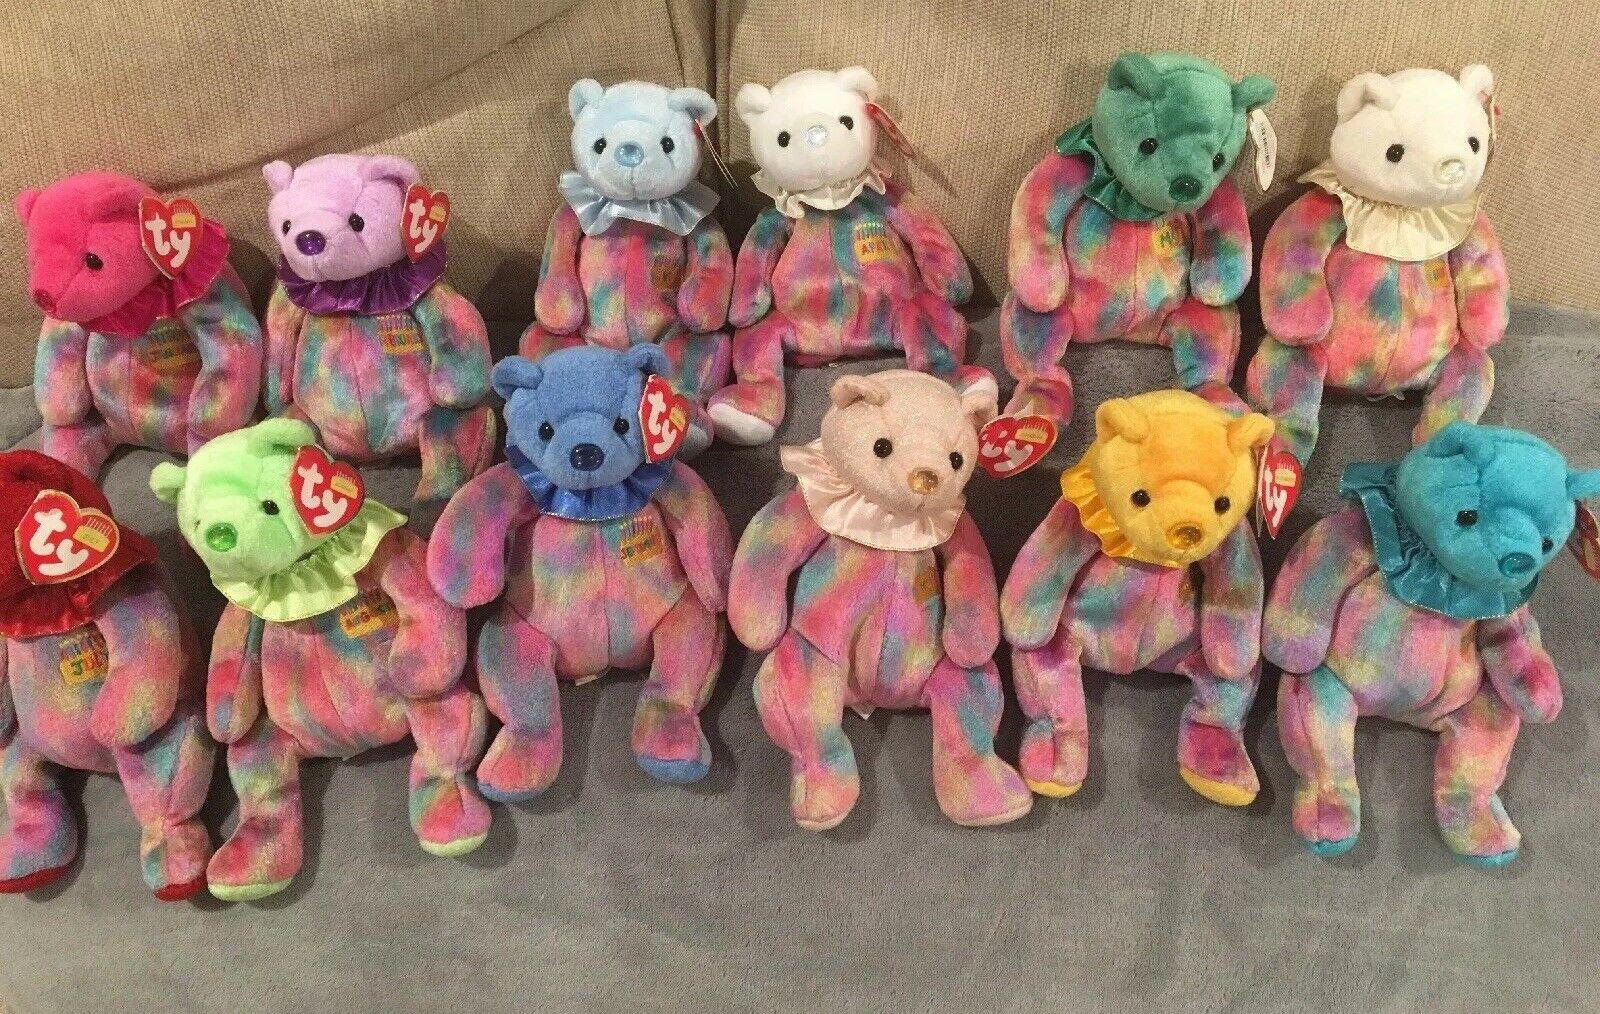 TY BEANIE BABIES-12 BIRTHDAY BEARS JAN-DEC TY BEANIE BABY COLLECTIBLE 2001